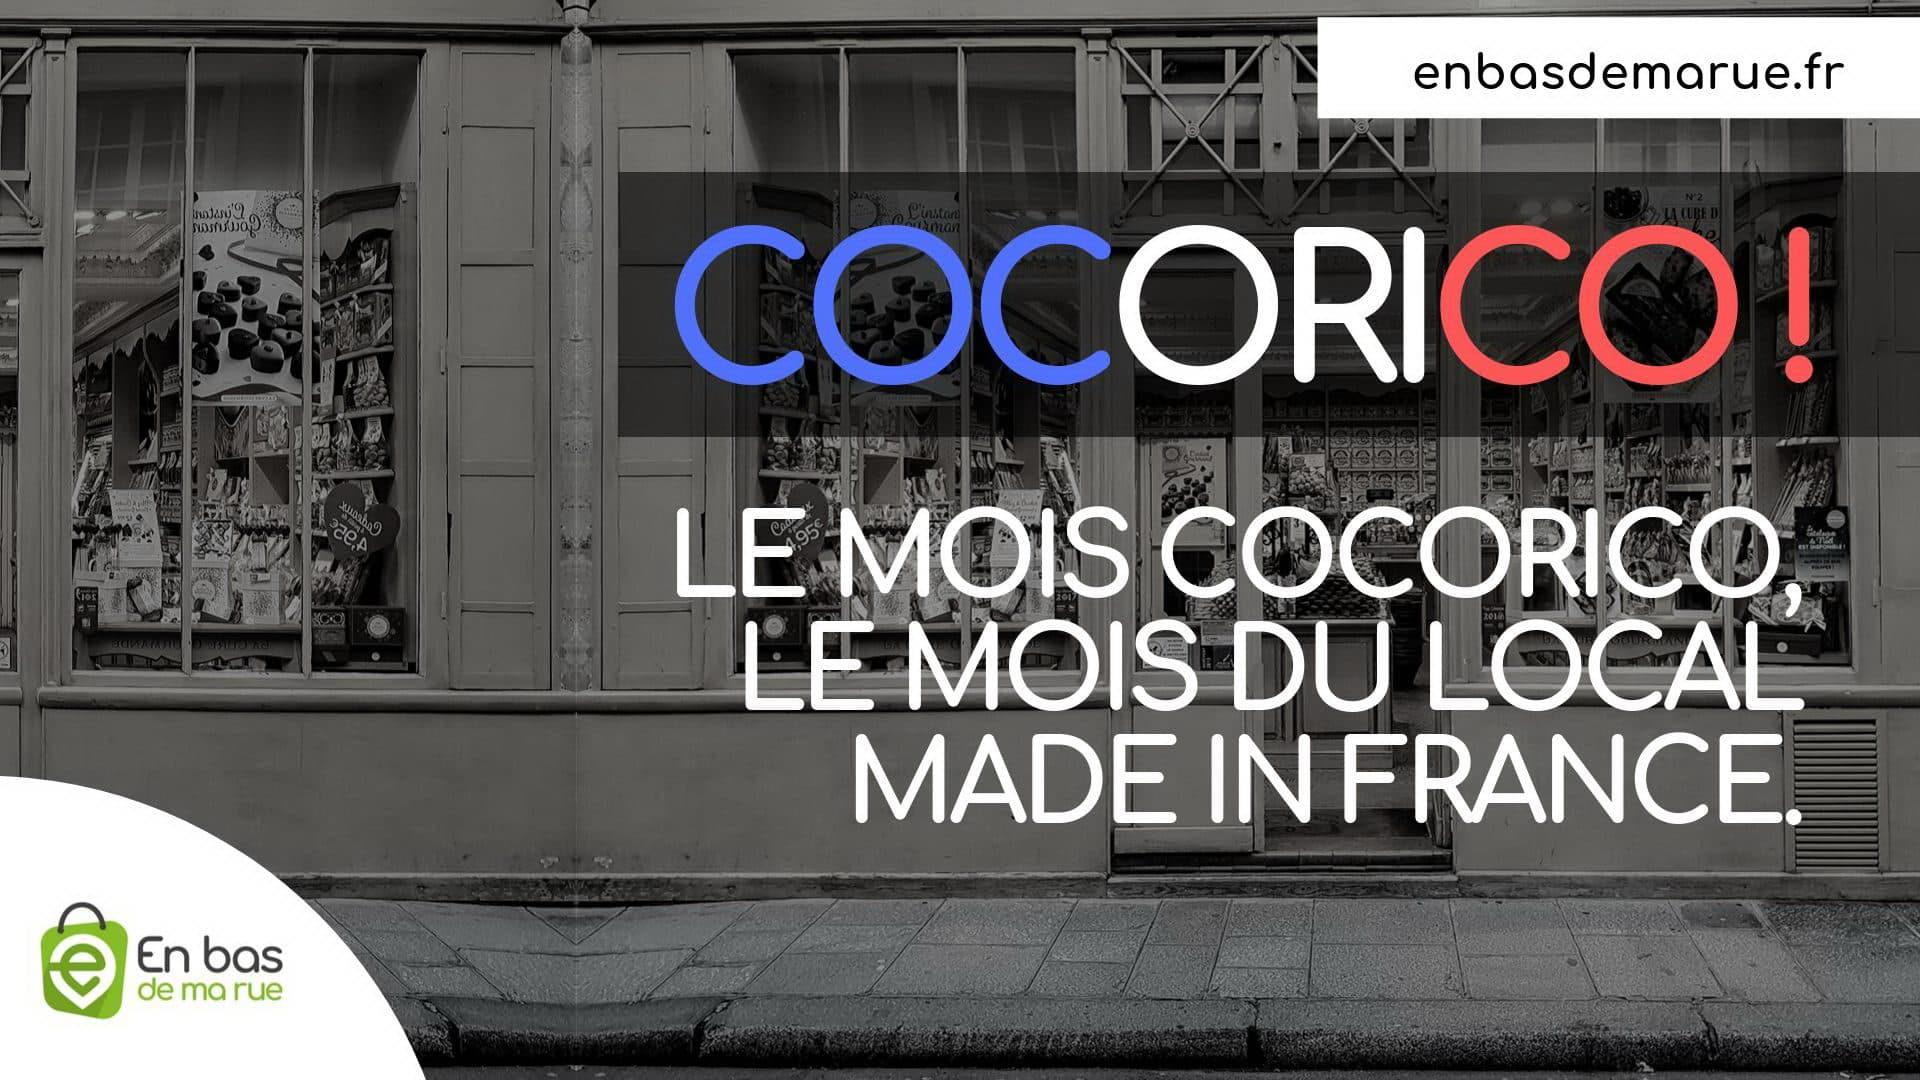 Cocorico ! Quand Enbasdemarue combine achat local et achat digital